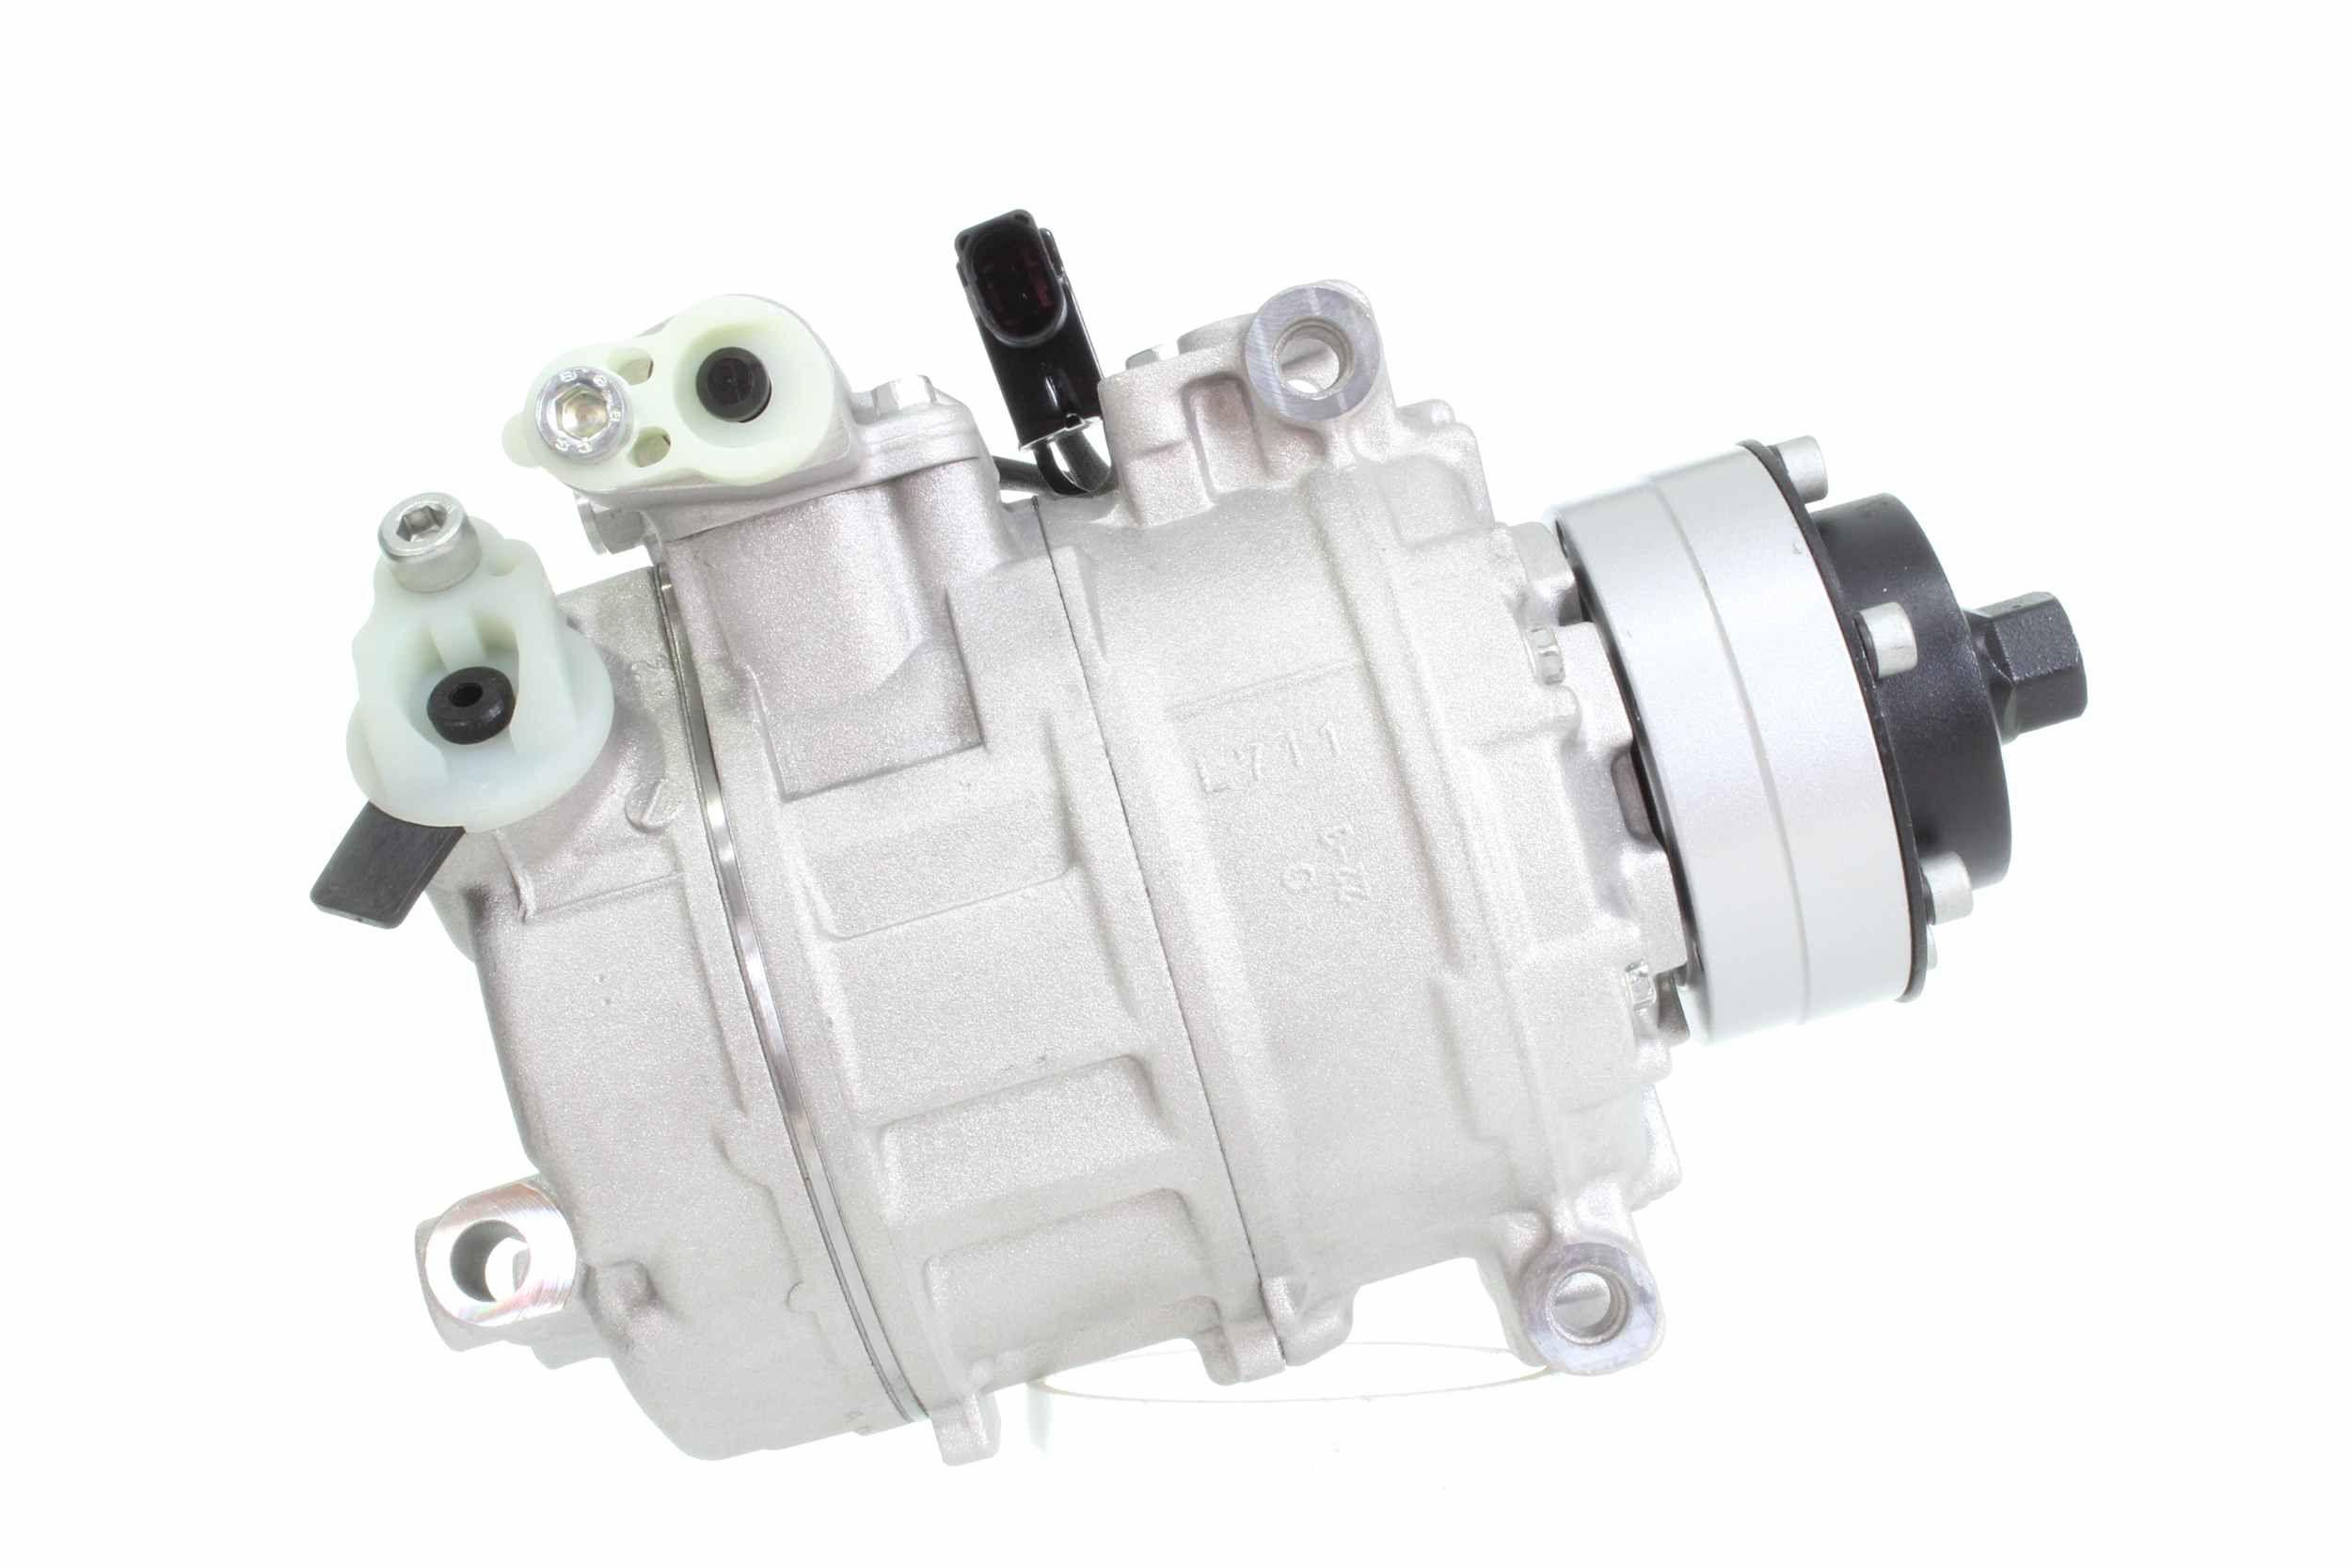 10550780 Kompressor, Klimaanlage ALANKO 550780 - Große Auswahl - stark reduziert